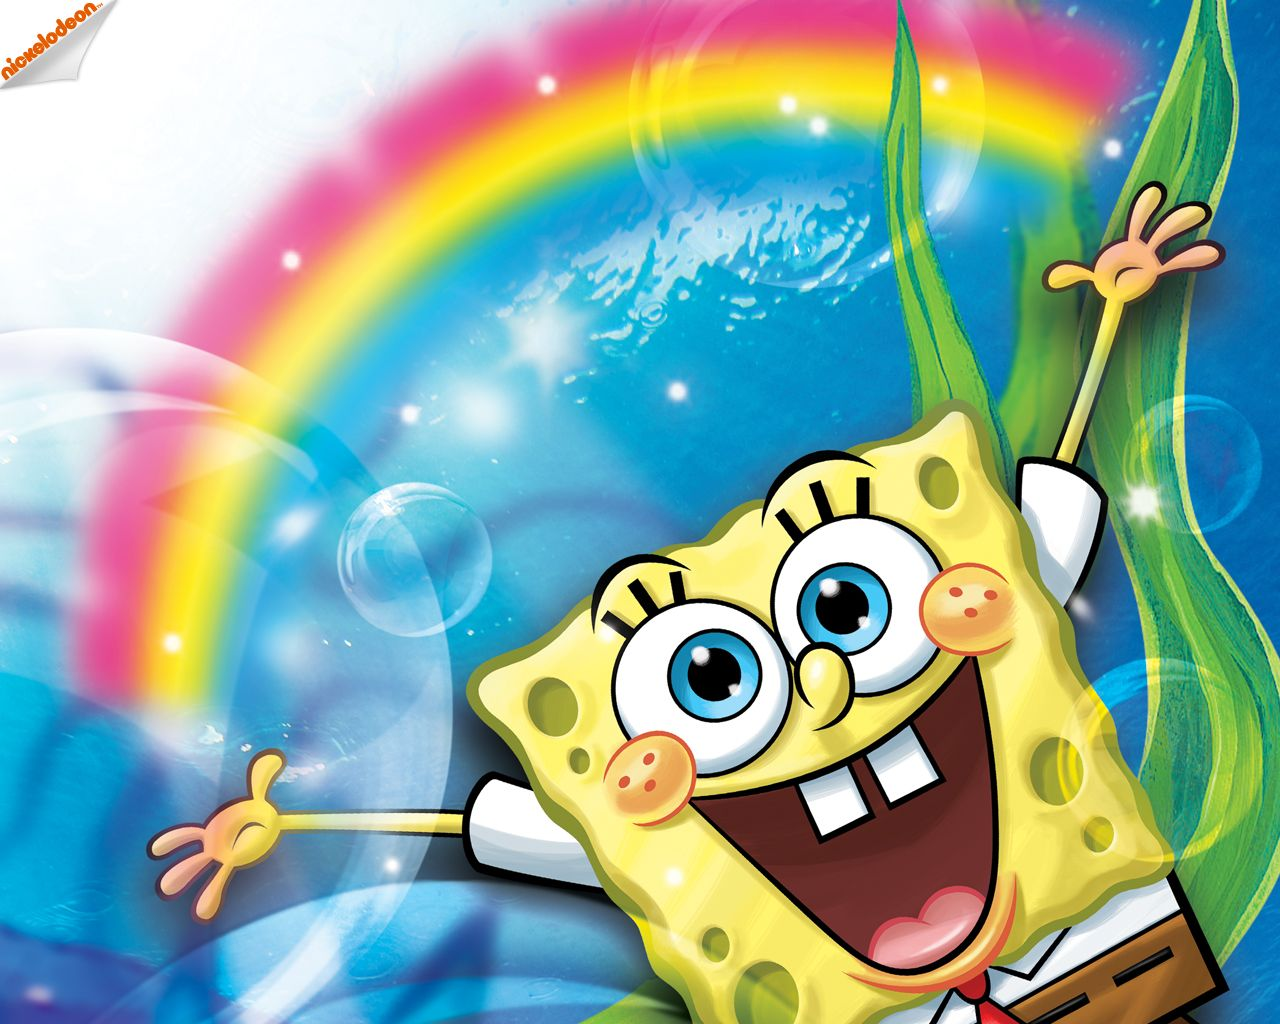 Desktop Wallpaper Spongebob Squarepants 1280x1024 Wallpaper Teahub Io